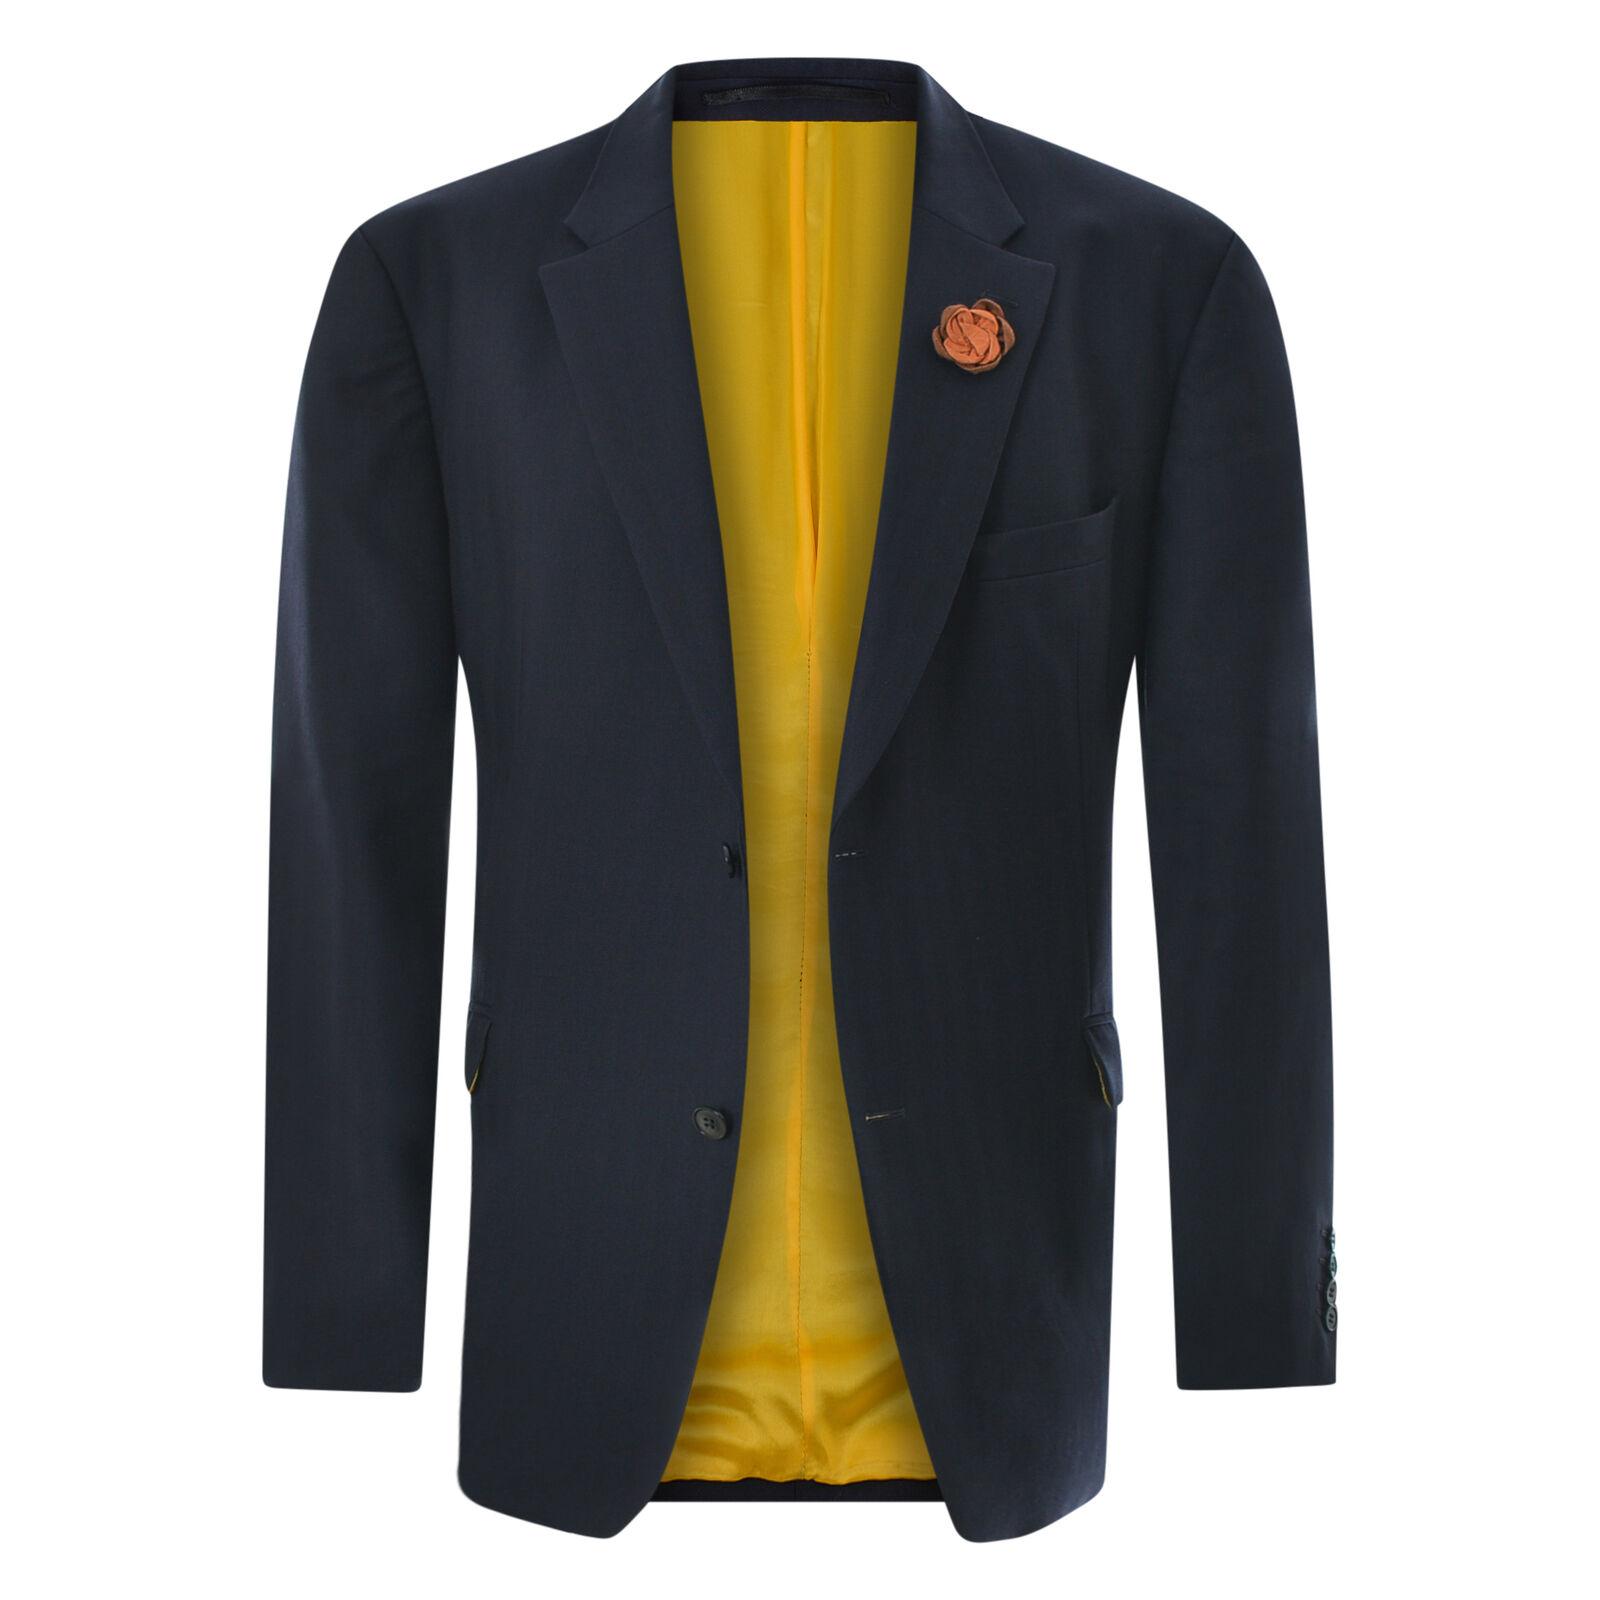 458adc9ba LEONARD JAY OF LONDON by Men's Blazer Size 50R bluee Wool Authentic ...